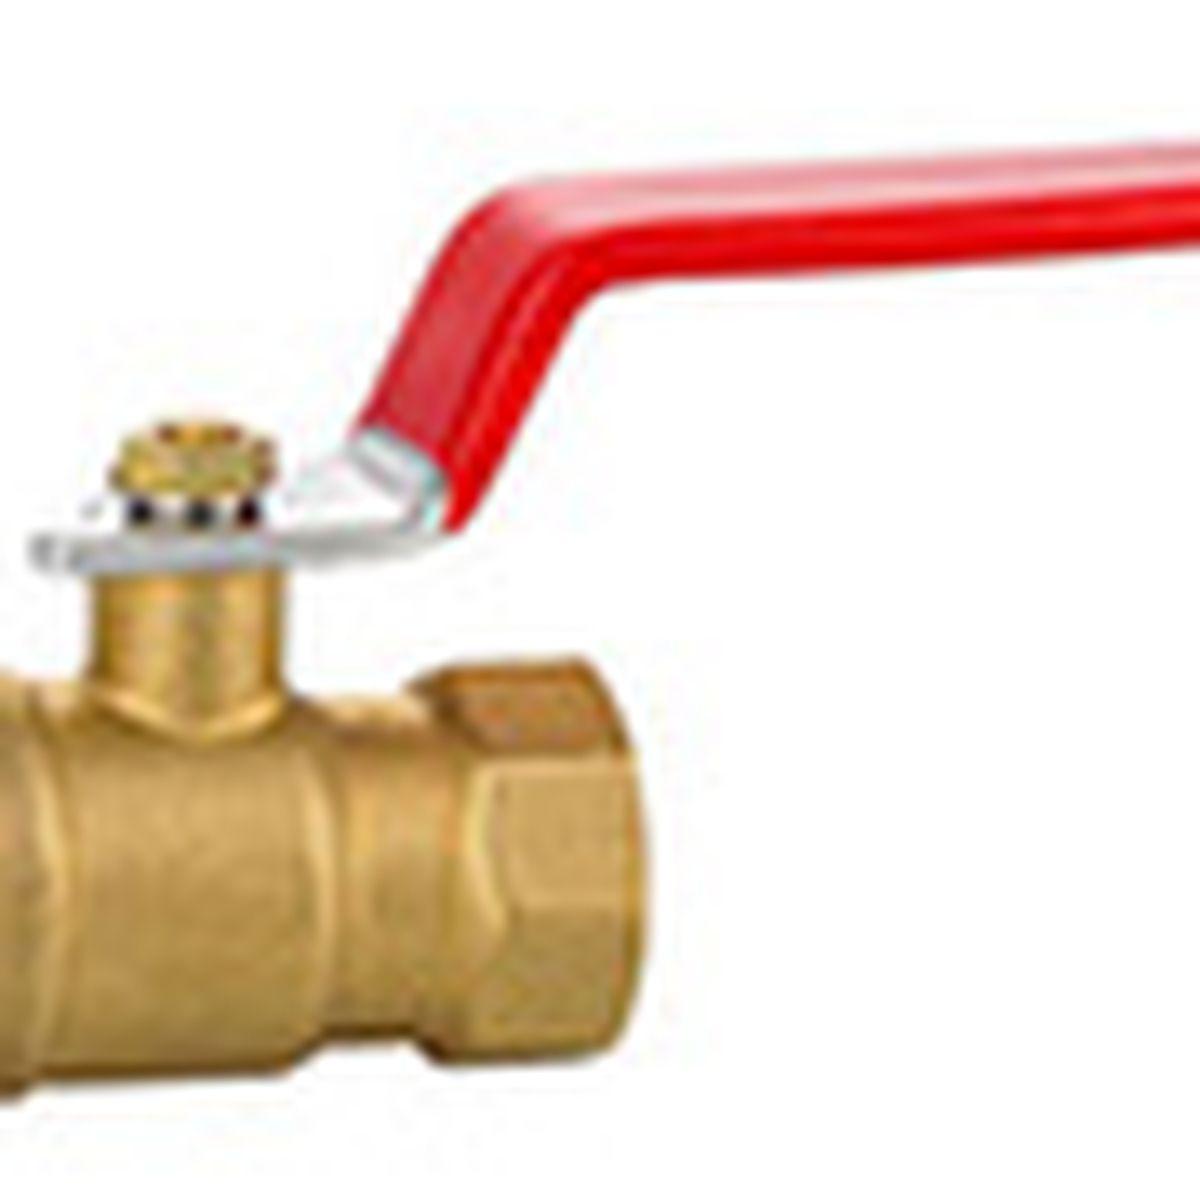 how to rebuild a hose spigot this old